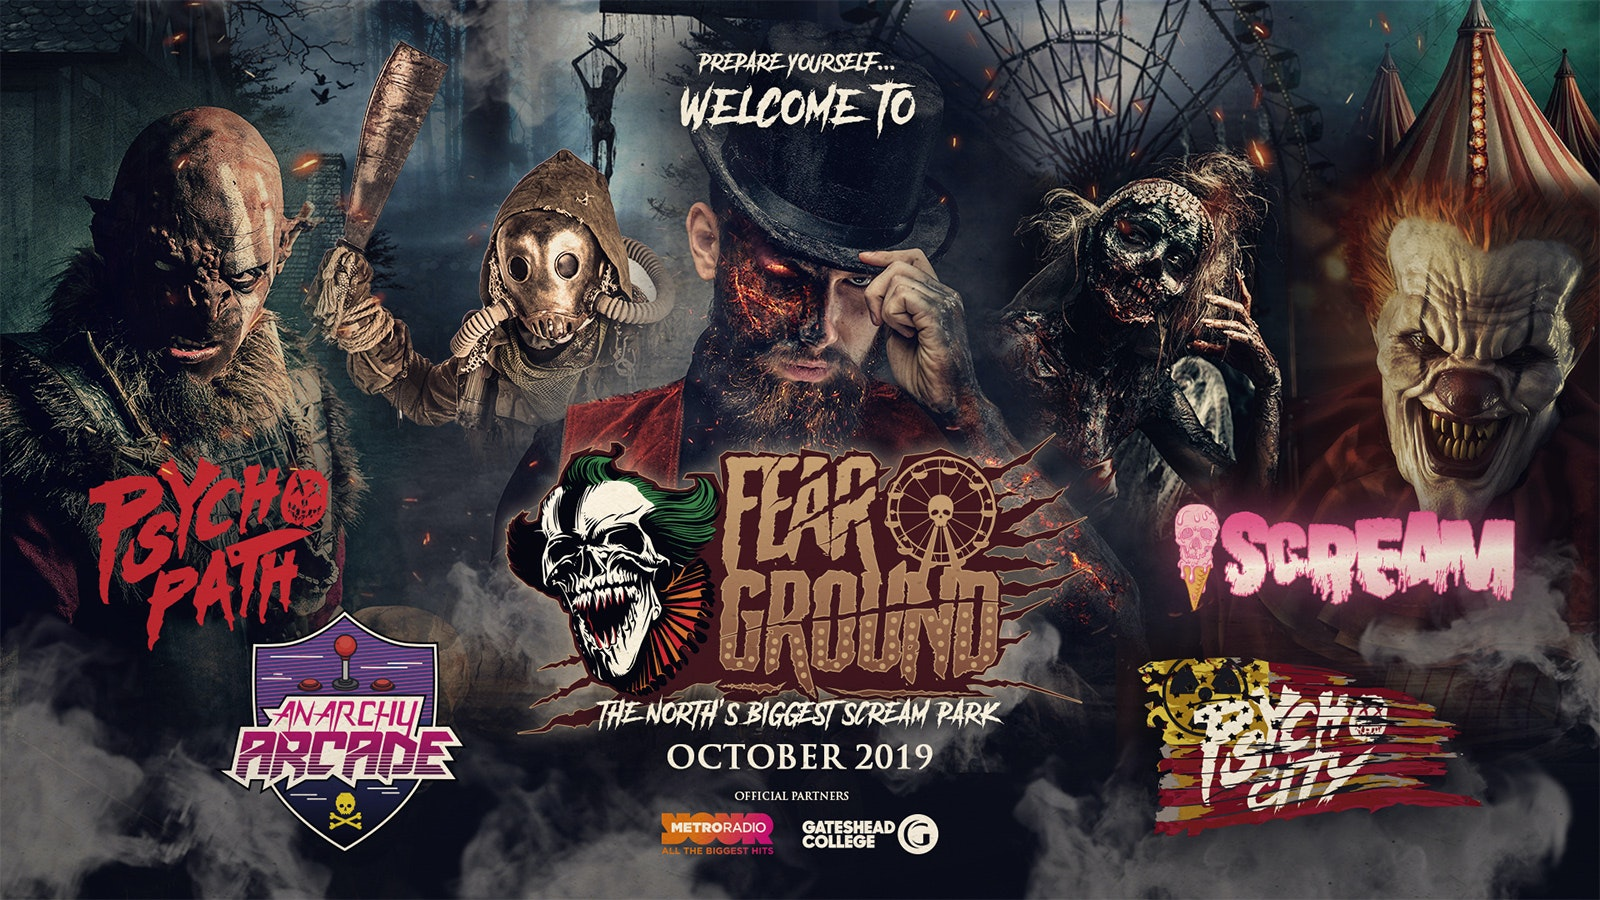 Psycho Path – Saturday 26th October 2019